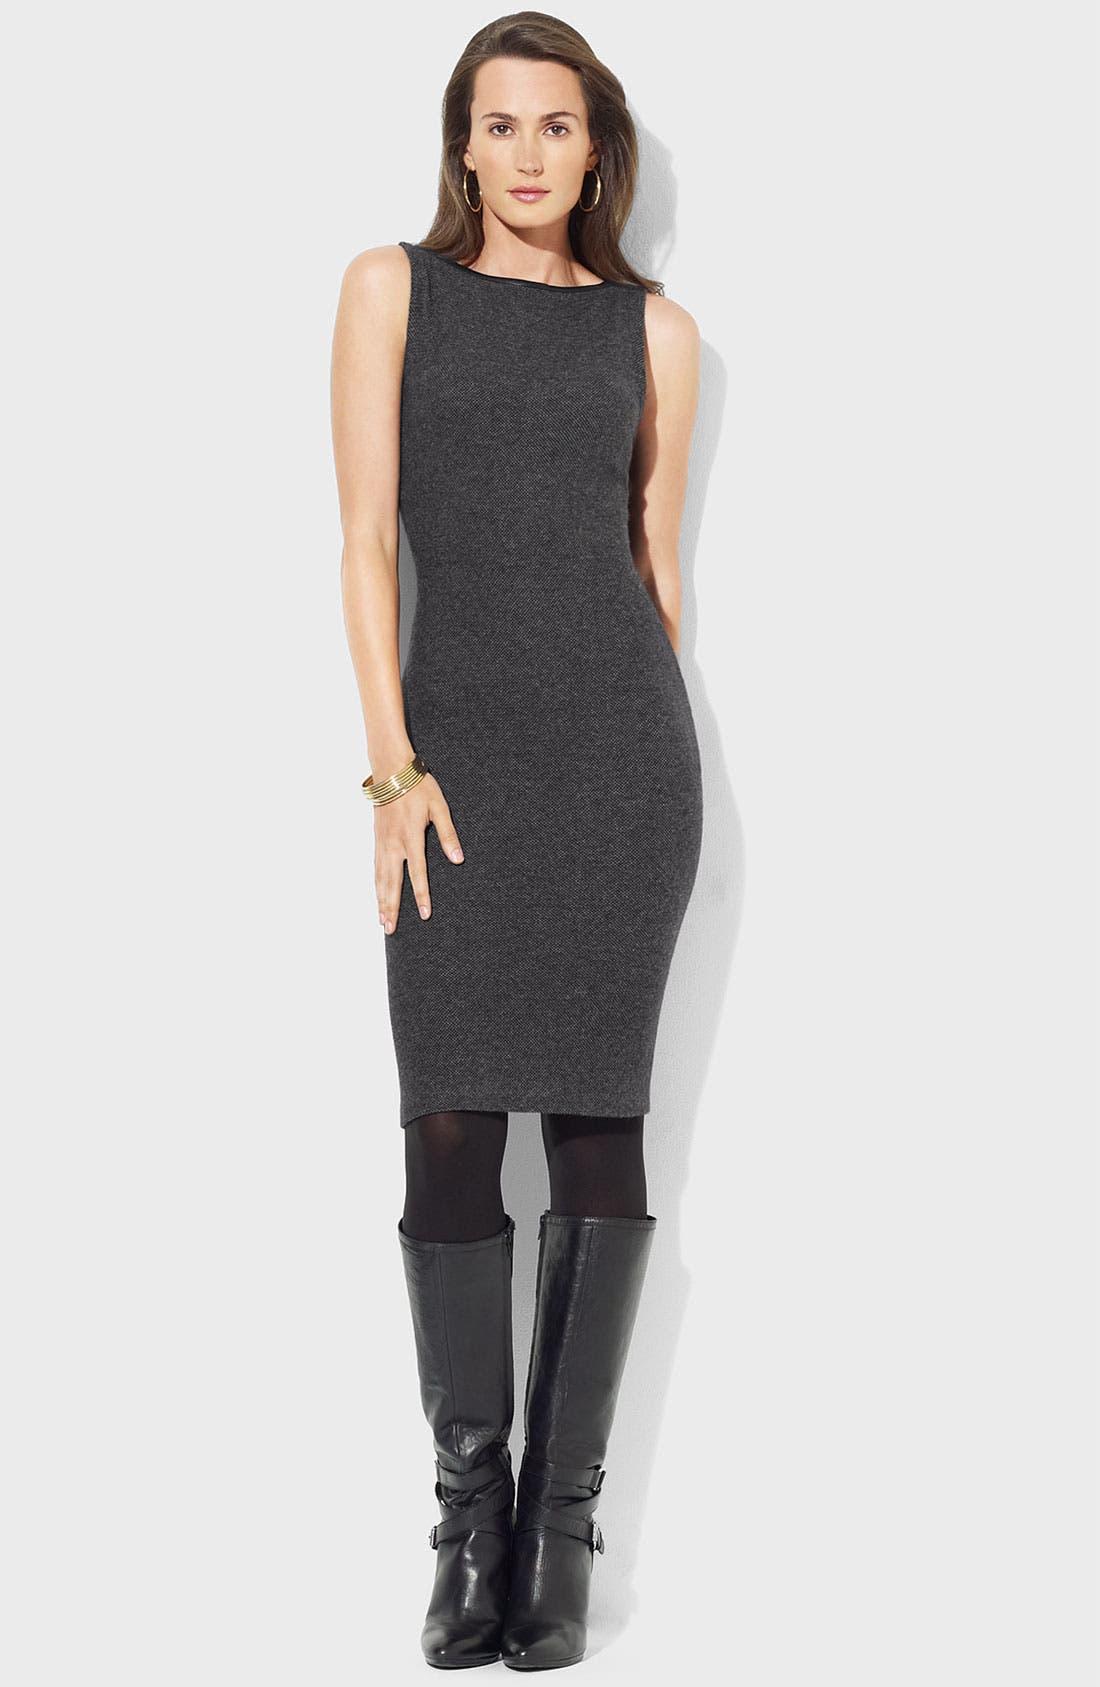 Alternate Image 1 Selected - Lauren Ralph Lauren Bateau Neck Knit Sheath Dress